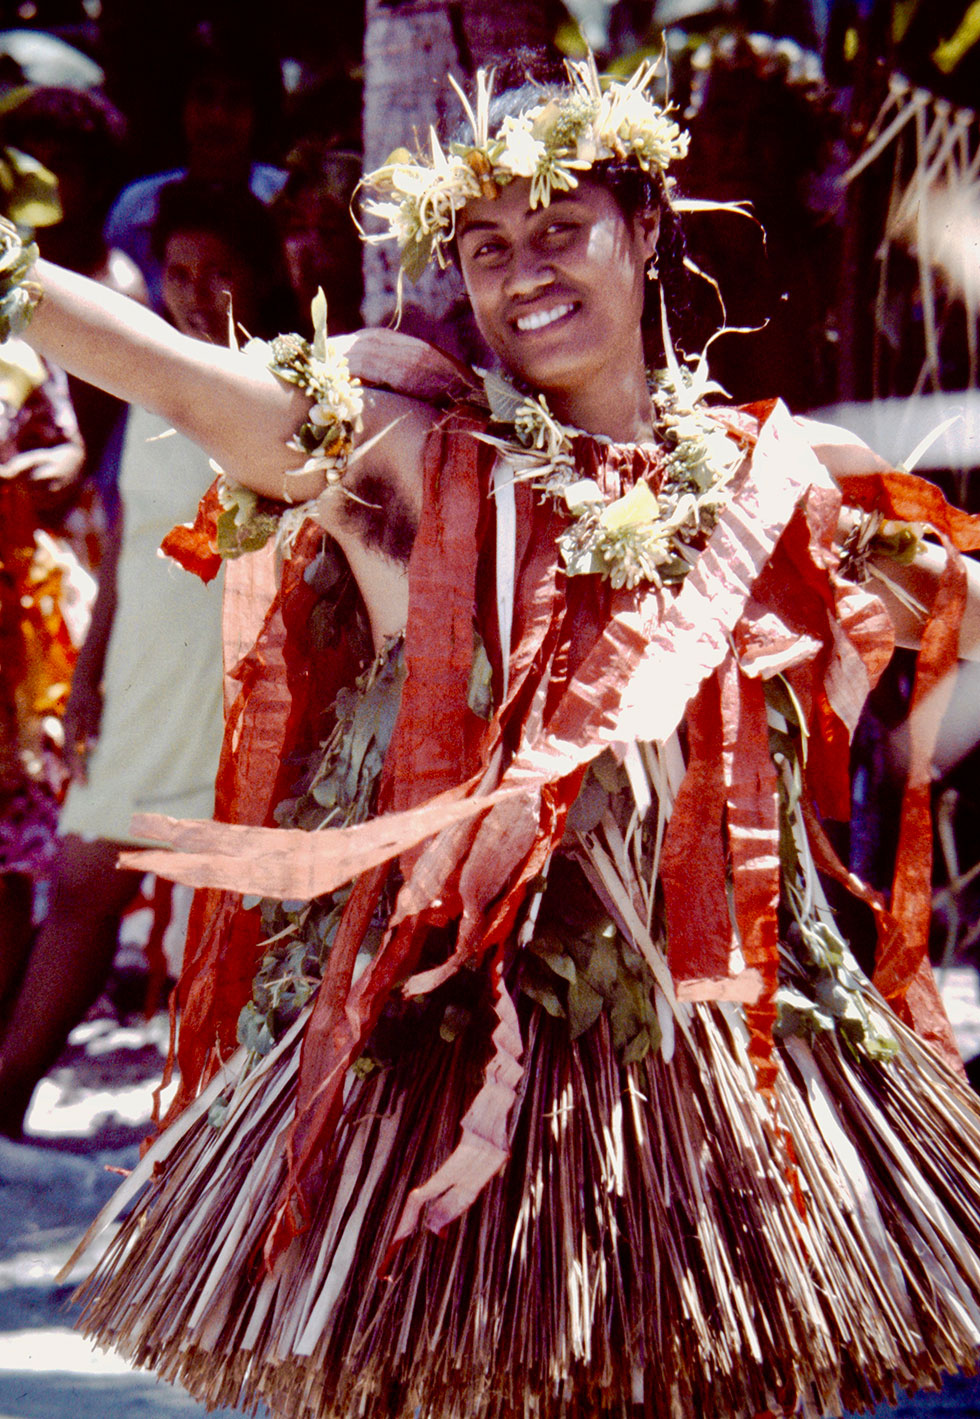 Tuvalu dancer